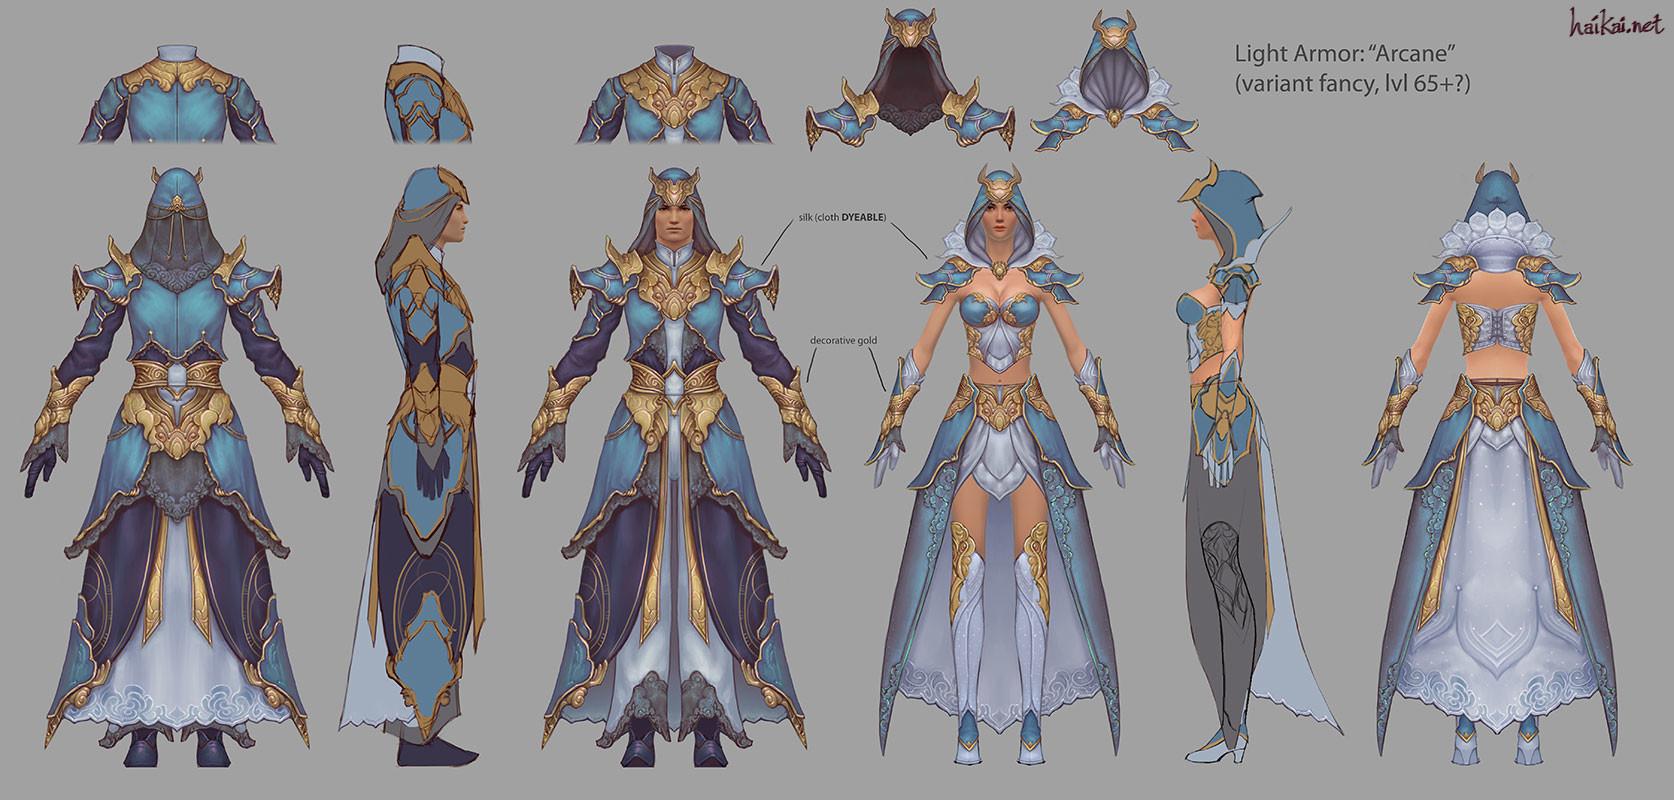 Hai Phan - Guild Wars 2 Light Armor Sets